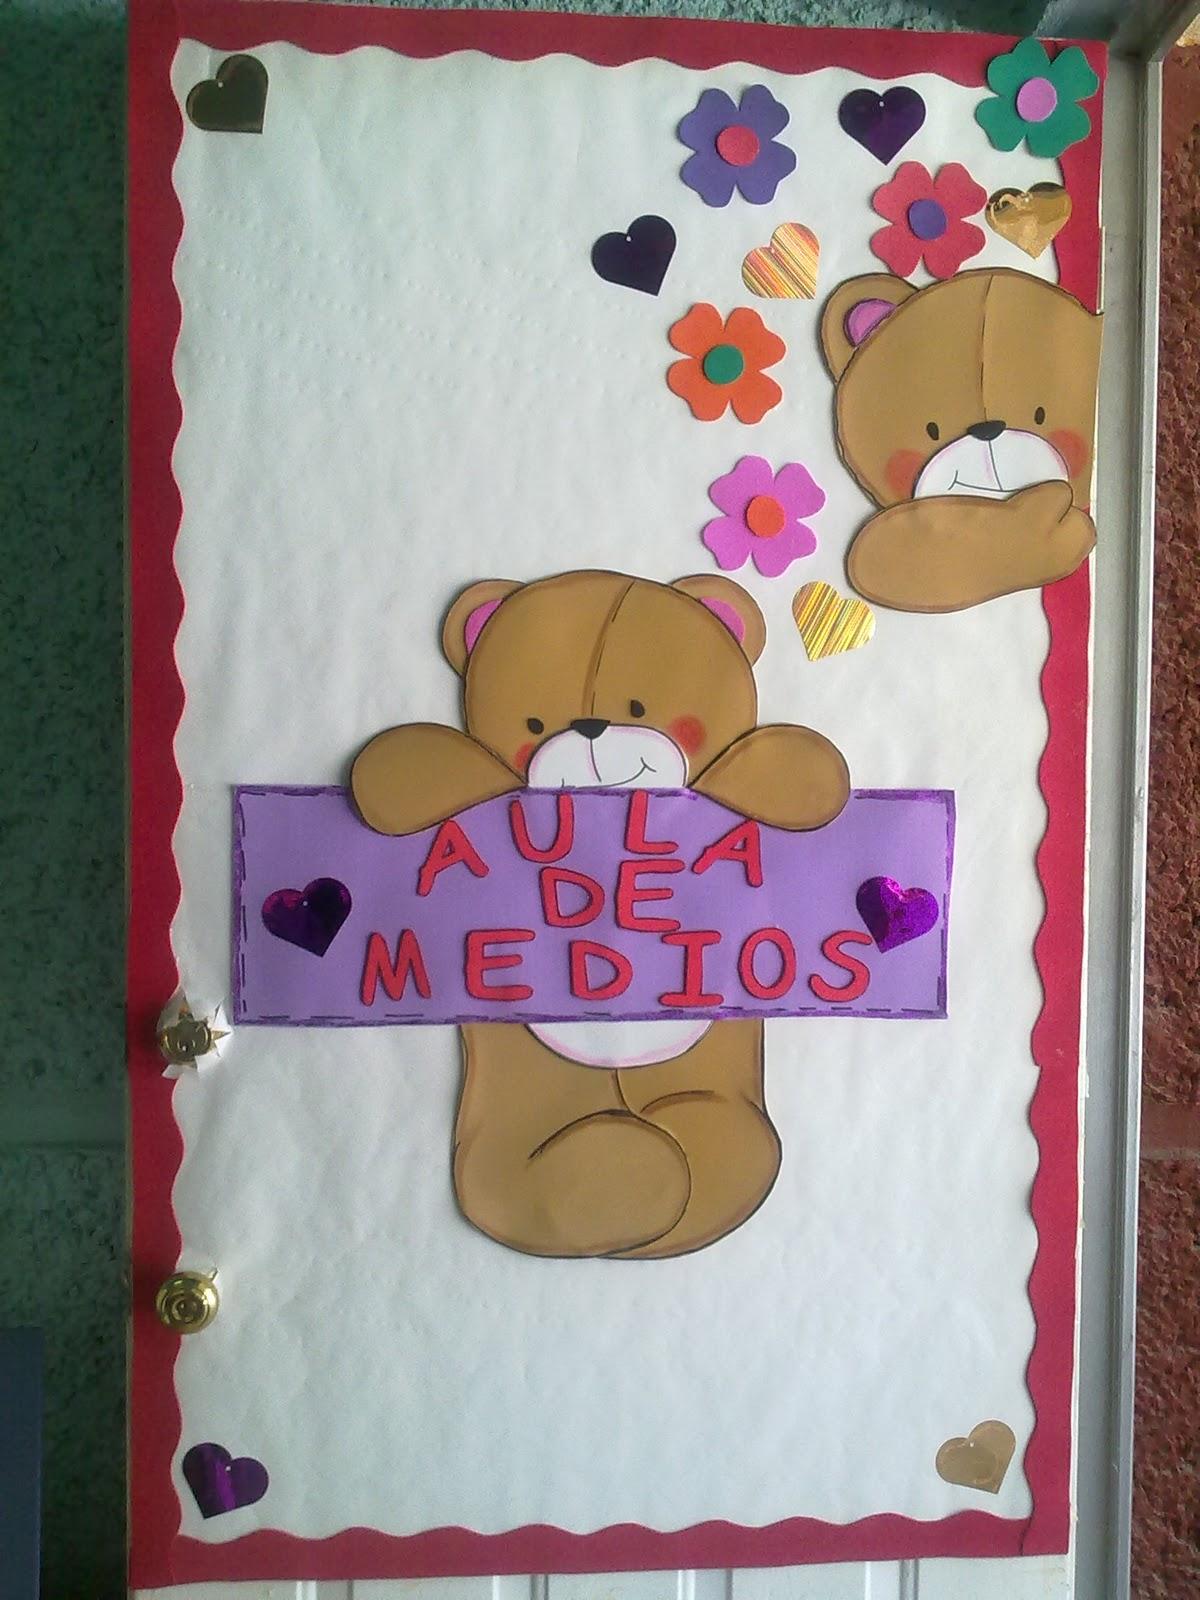 Mis actividades preescolar decorados puertas for Puertas 3 de febrero